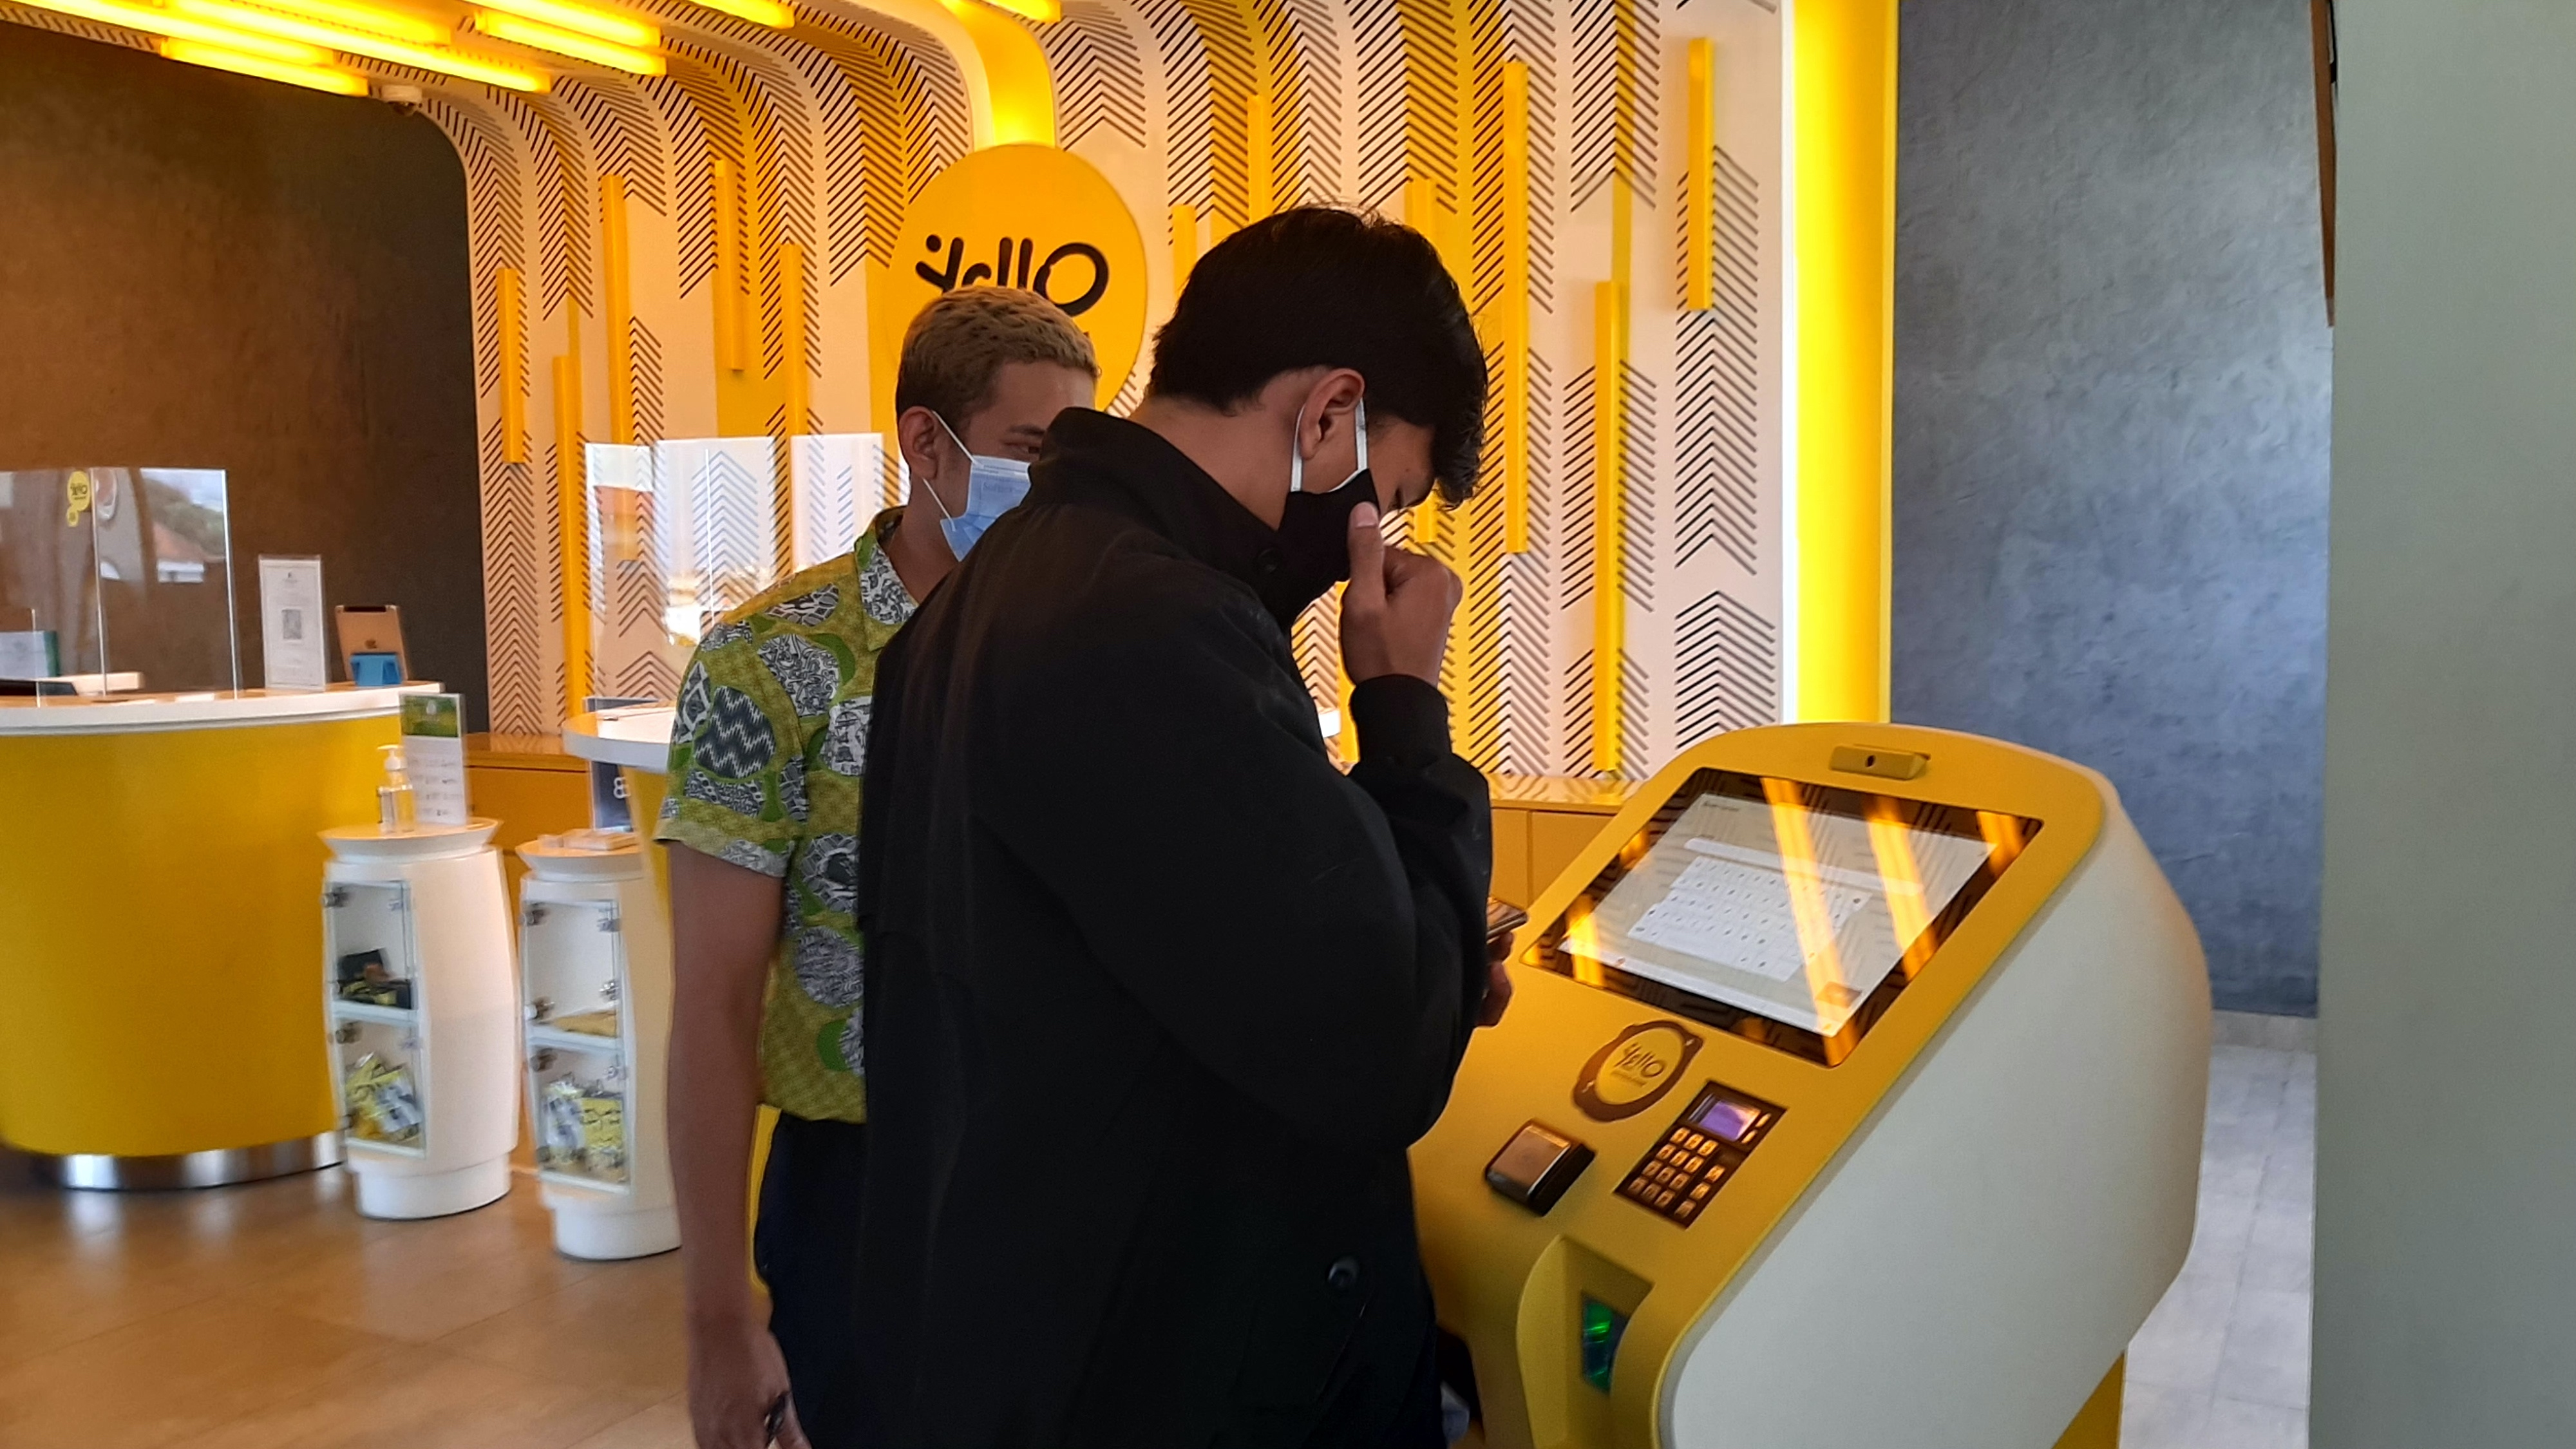 Yello Hotel Paskal and MYRA Self Check-in kiosk Solution